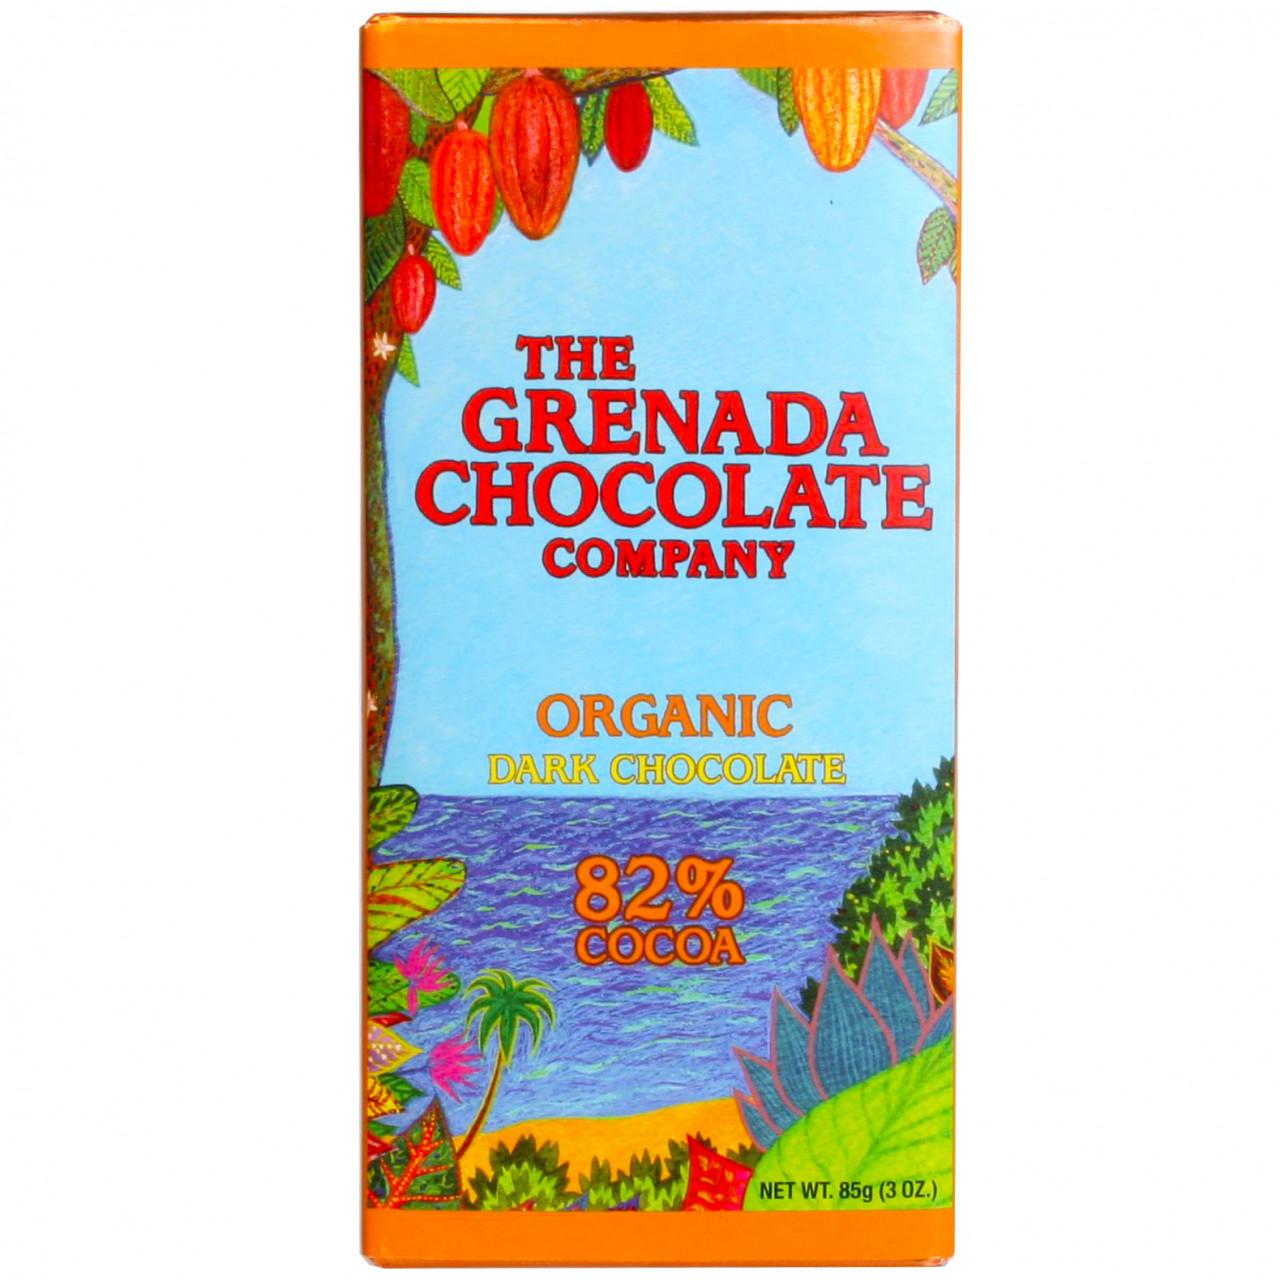 Grenada Chocolate, Bio Schokolade, Organic Chocolate, Dunkle Schokolade, Edelbitterschokolade, Schokolade von Grenada, Nussfreie Schokolade, Organic Chocolate, dark chocolate, chocolat noir, Grenada C - Tablette de chocolat, chocolat sans noix, Grenada, chocolat de Grenade, Chocolat avec sucre - Chocolats-De-Luxe